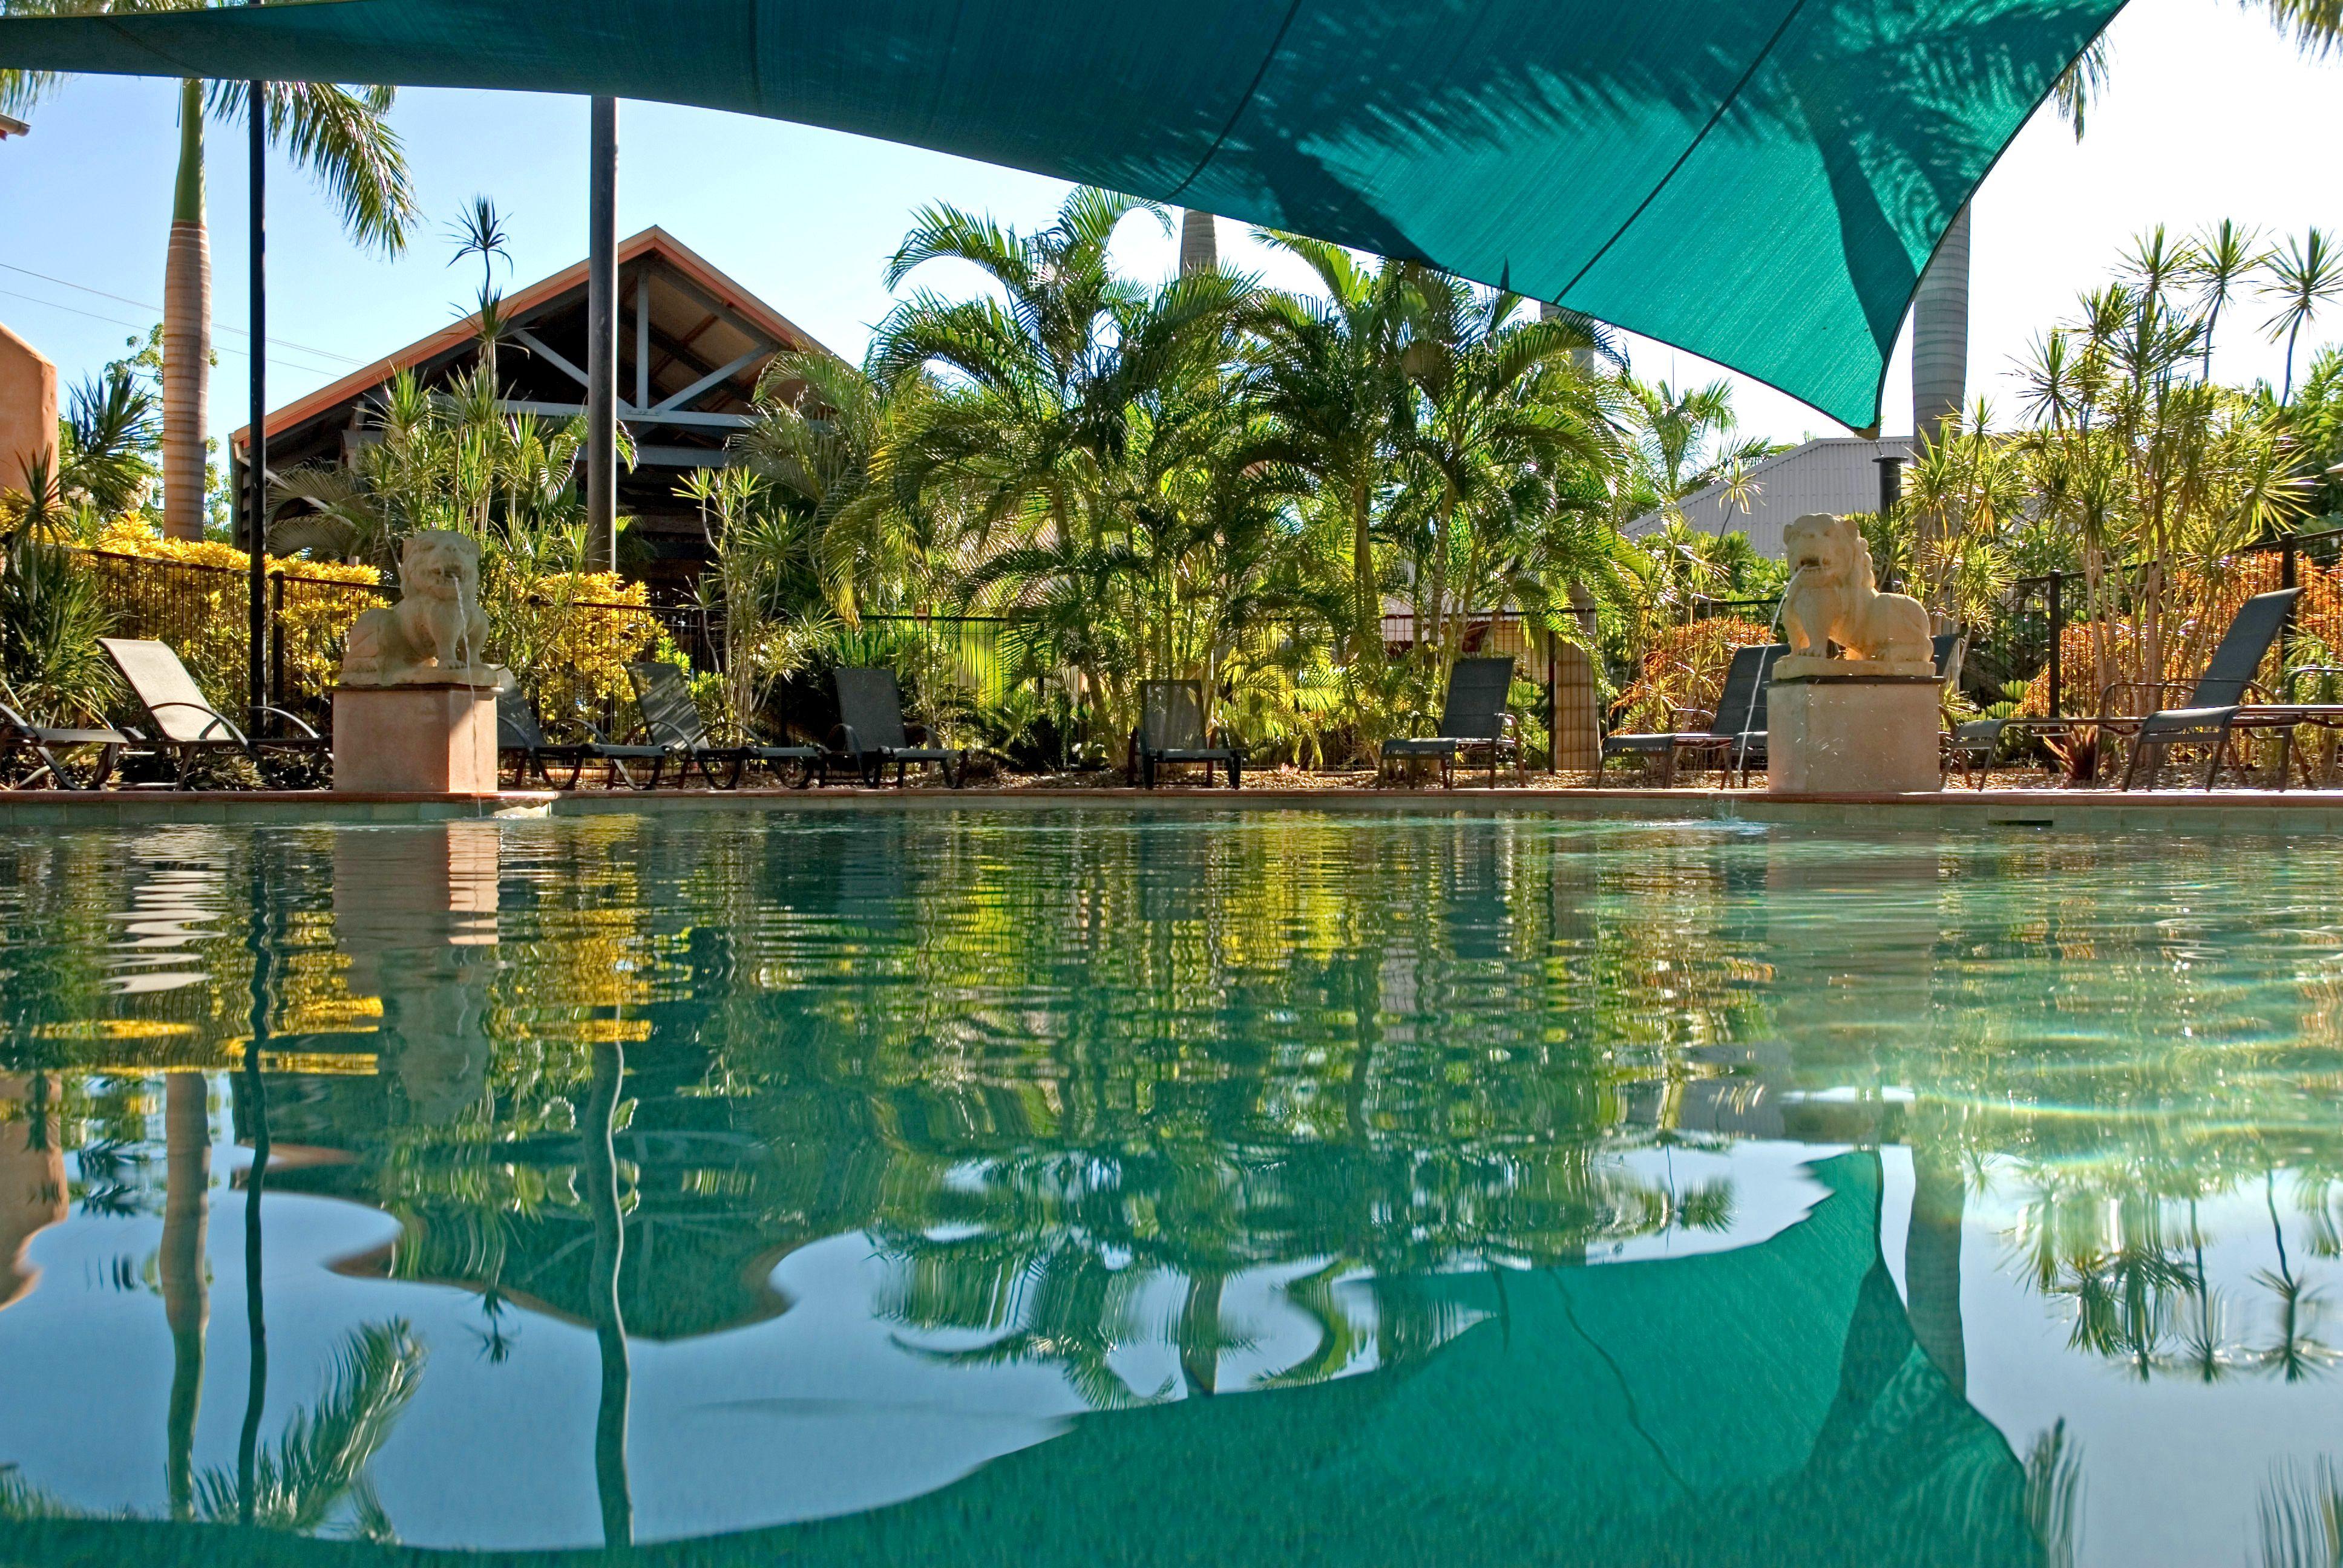 Desert Gardens Hotel Ayers Rock Resort